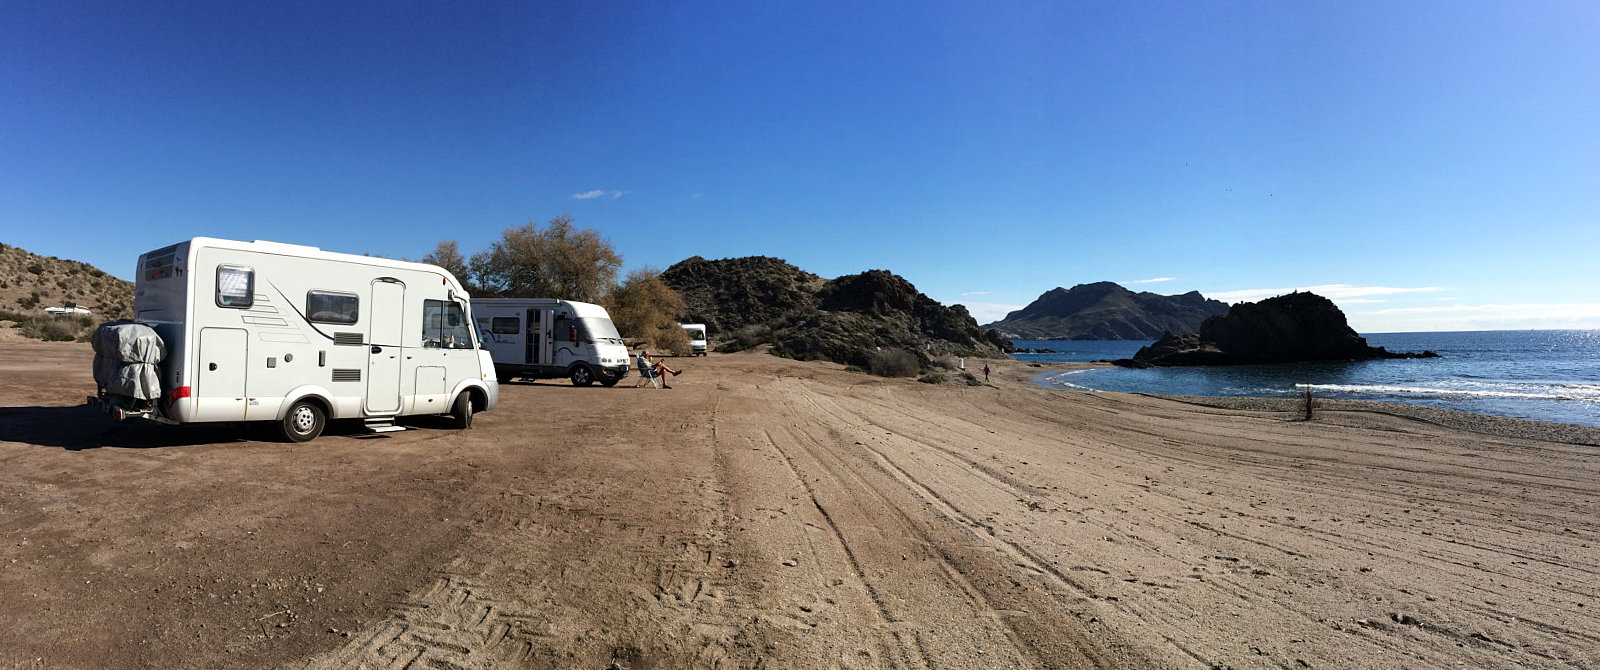 Sosta libera in camper ad Aguilas sullla Playa de Arroz